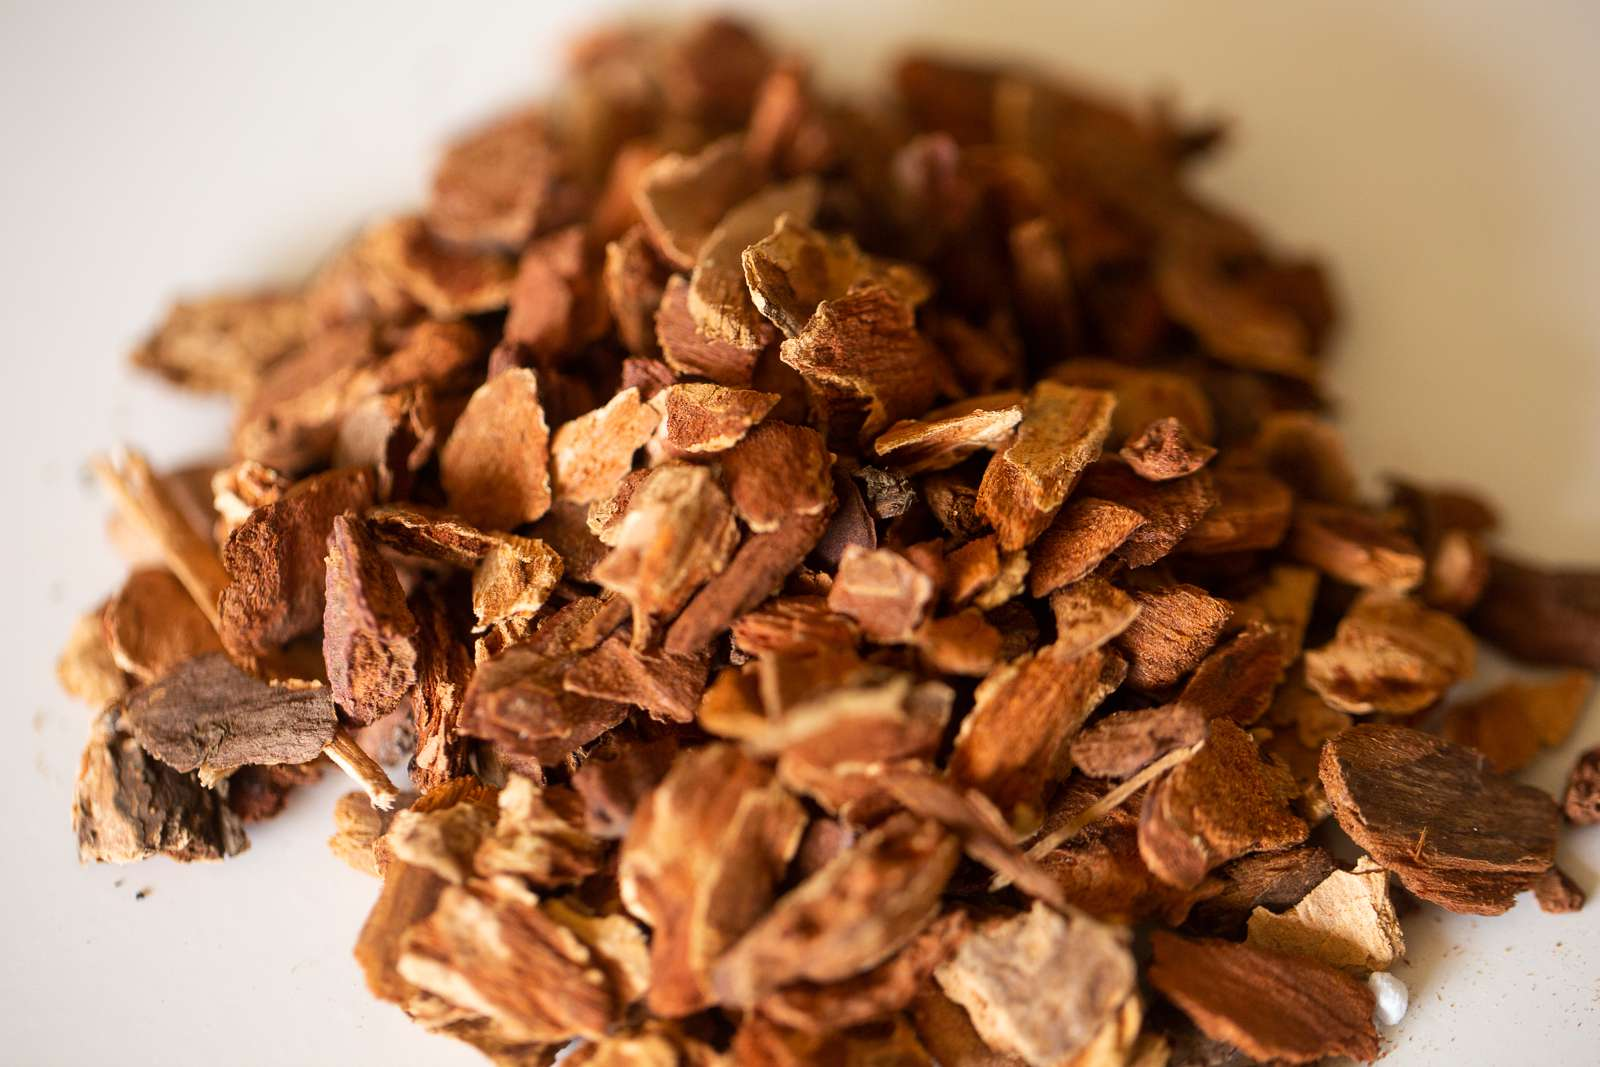 Pile of bark chips for soilless potting mix closeup